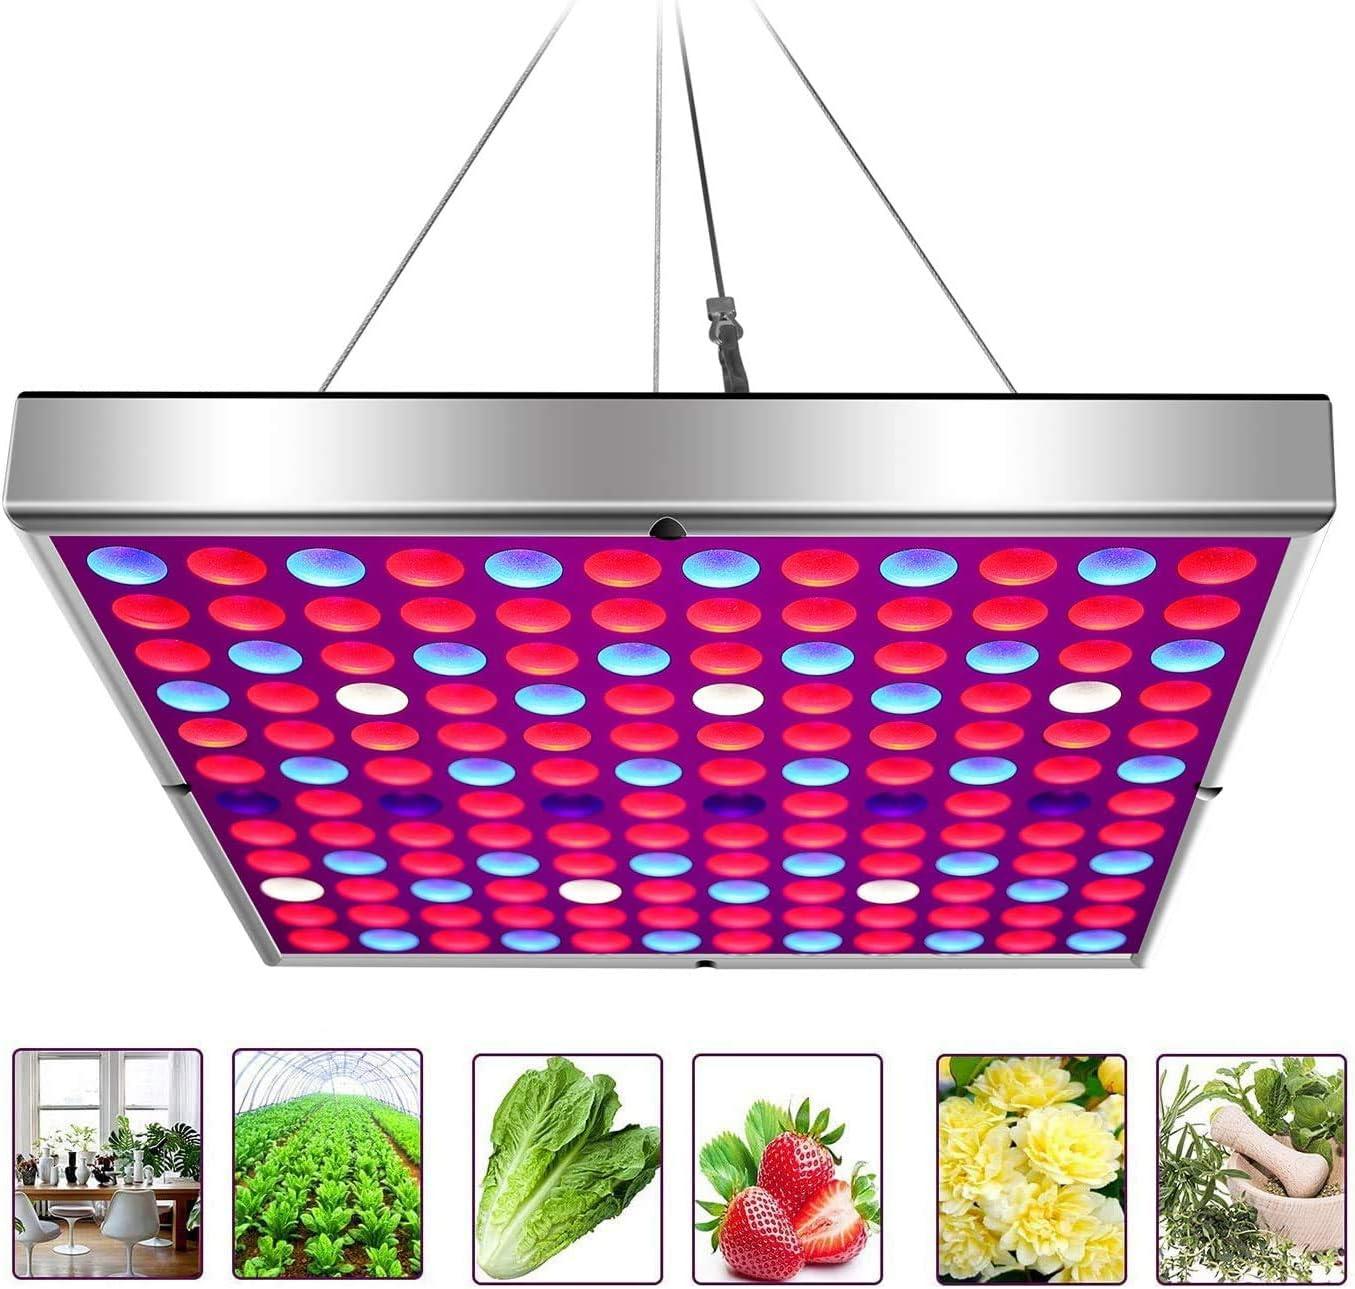 Gtmar 45W LED Grow Light for Indoor Plants Growing Lamp for Greenhouse Tent Indoor Succulent Plants Seedlings Flowering Veg Bloom Hydroponic Garden